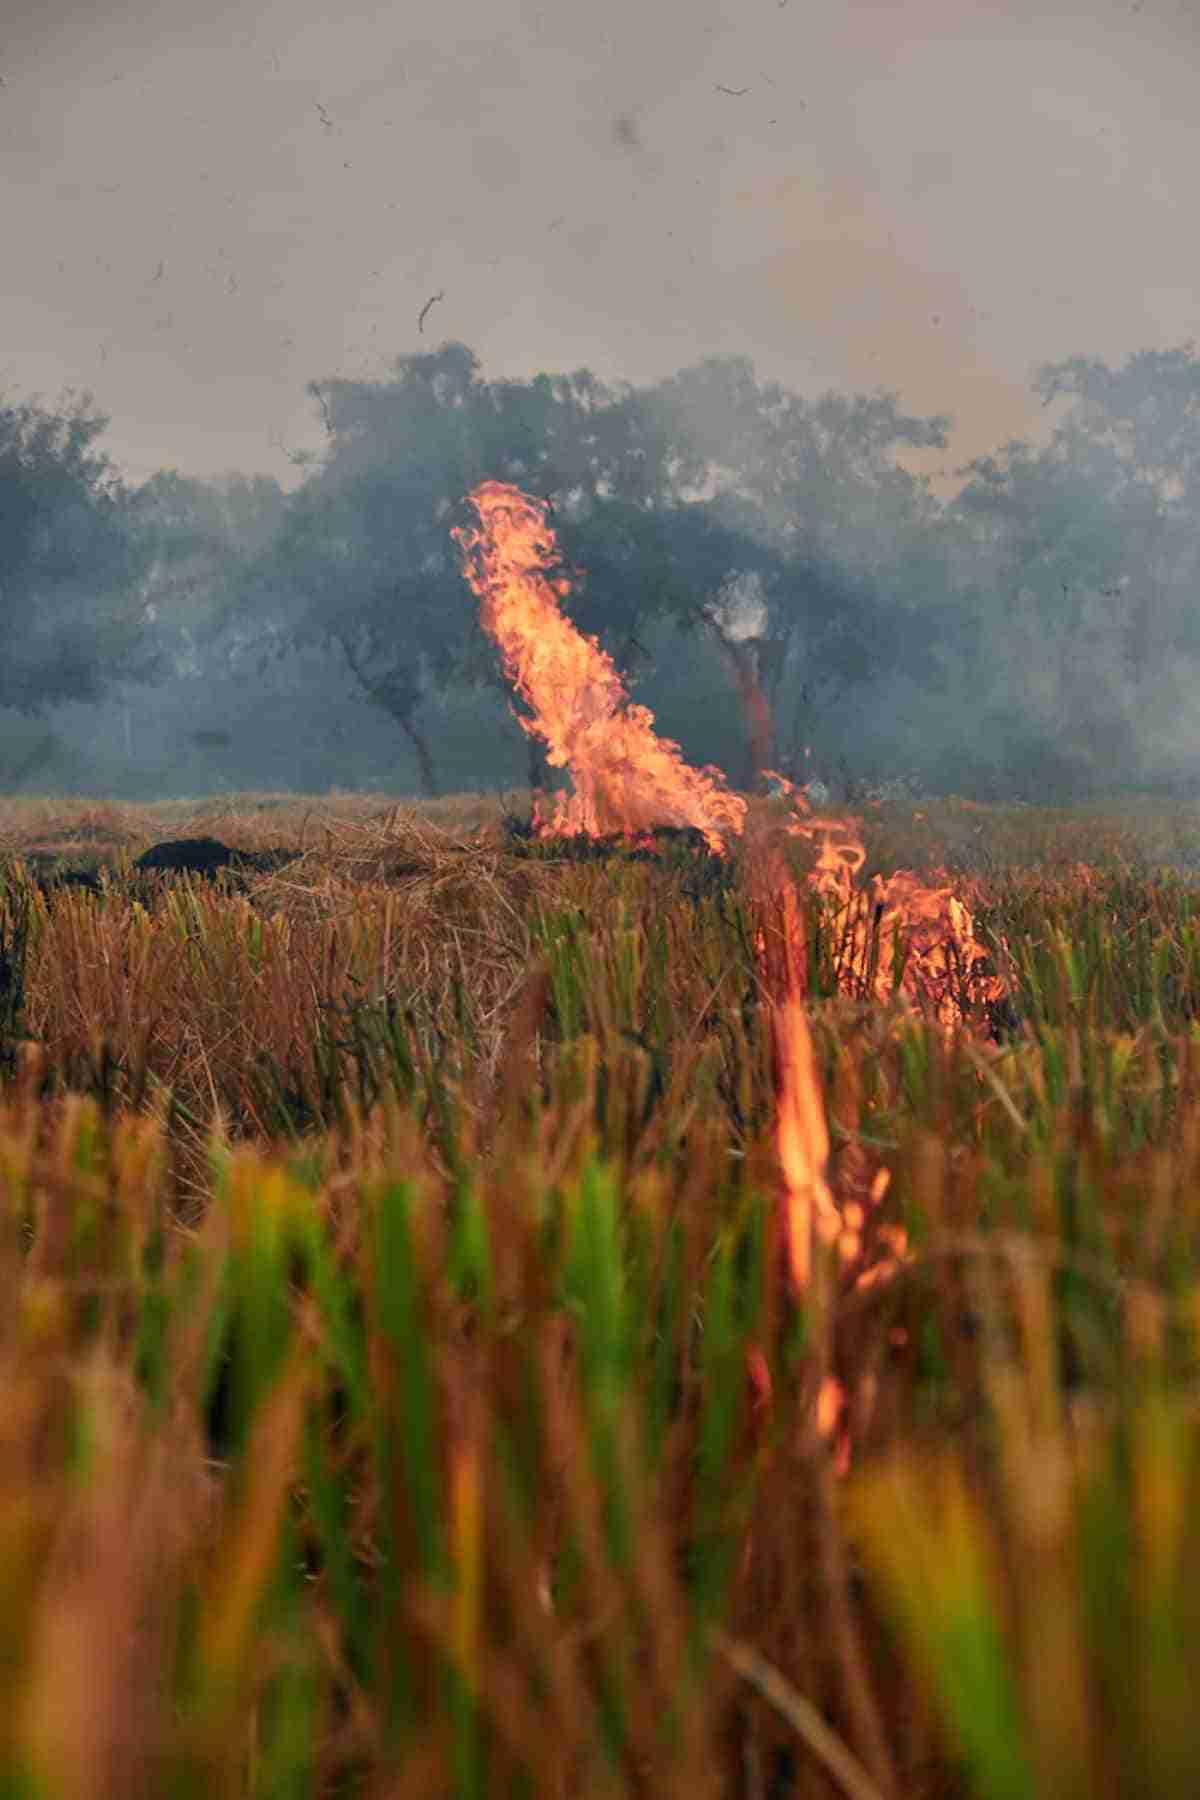 la quema de los tallos del arroz contamina el aire